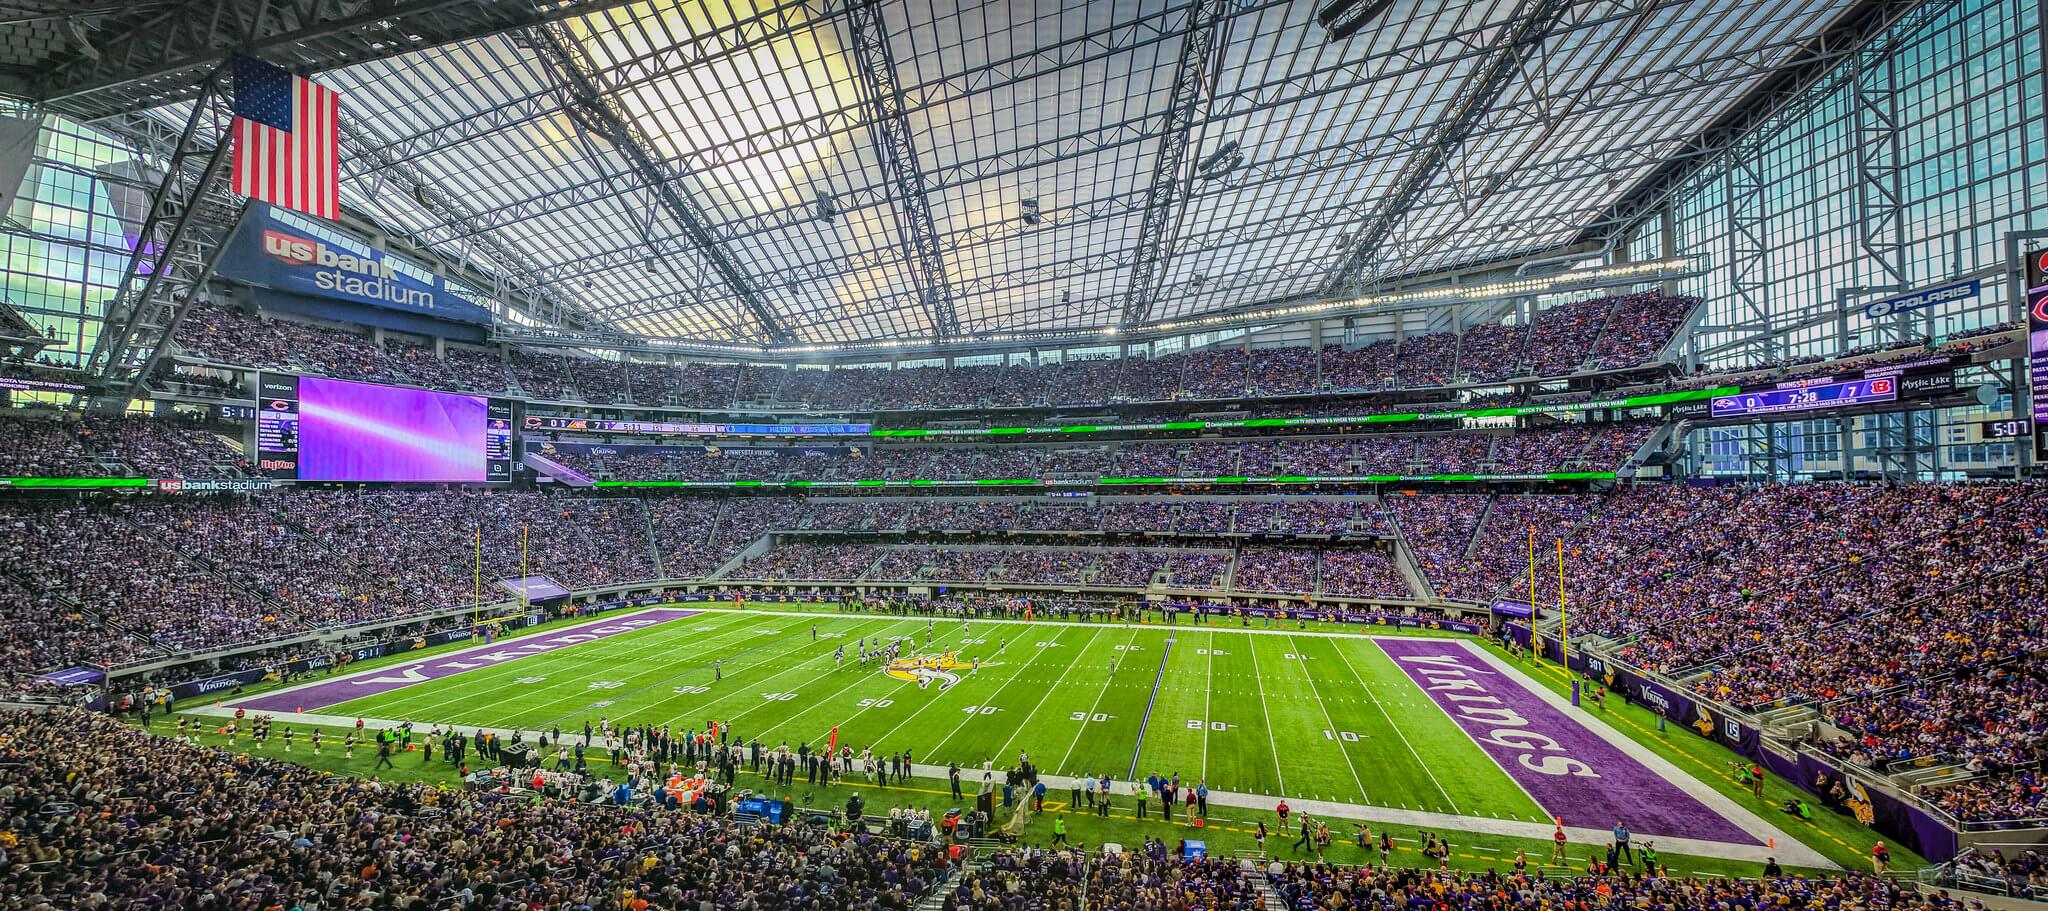 US Bank Stadium football game